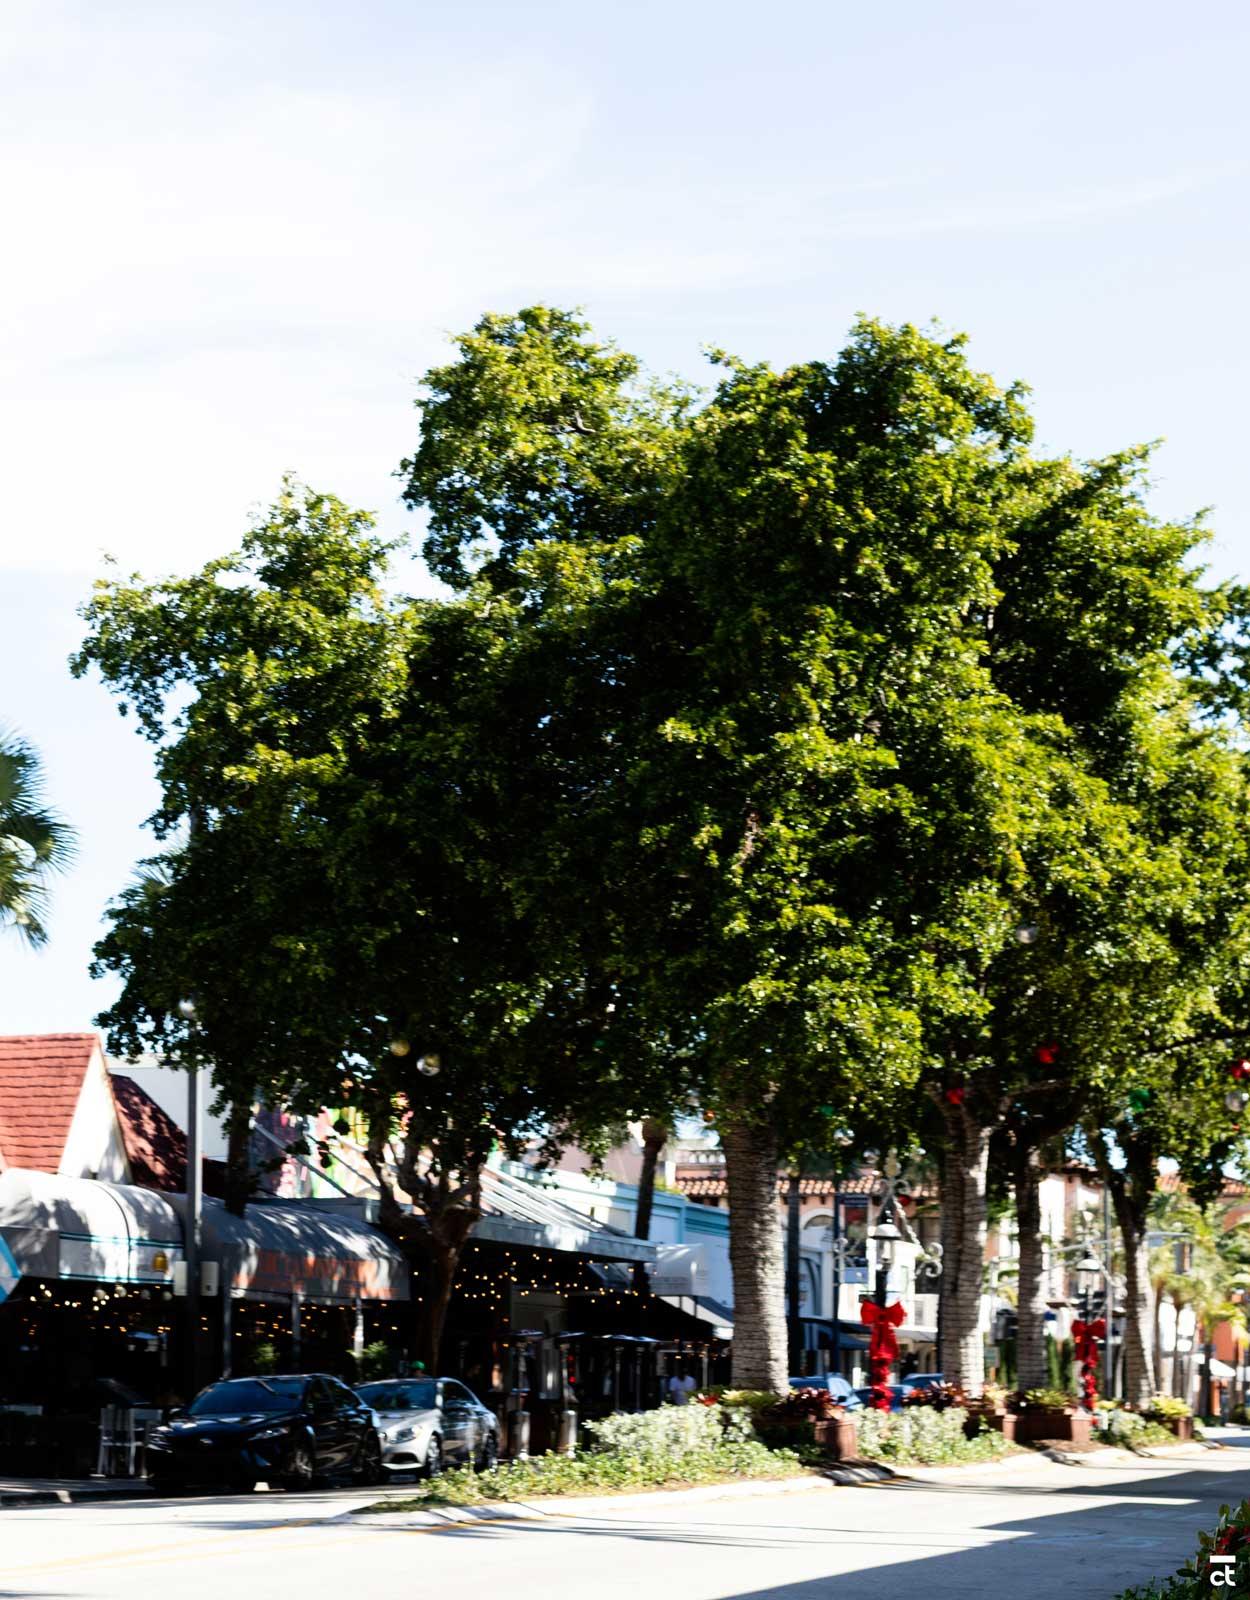 LAS OLAS BOULEVARD - Fort Lauderdale Travel Guide: 25 Things to Do in Fort Lauderdale, Florida - CHRISTOBEL TRAVEL